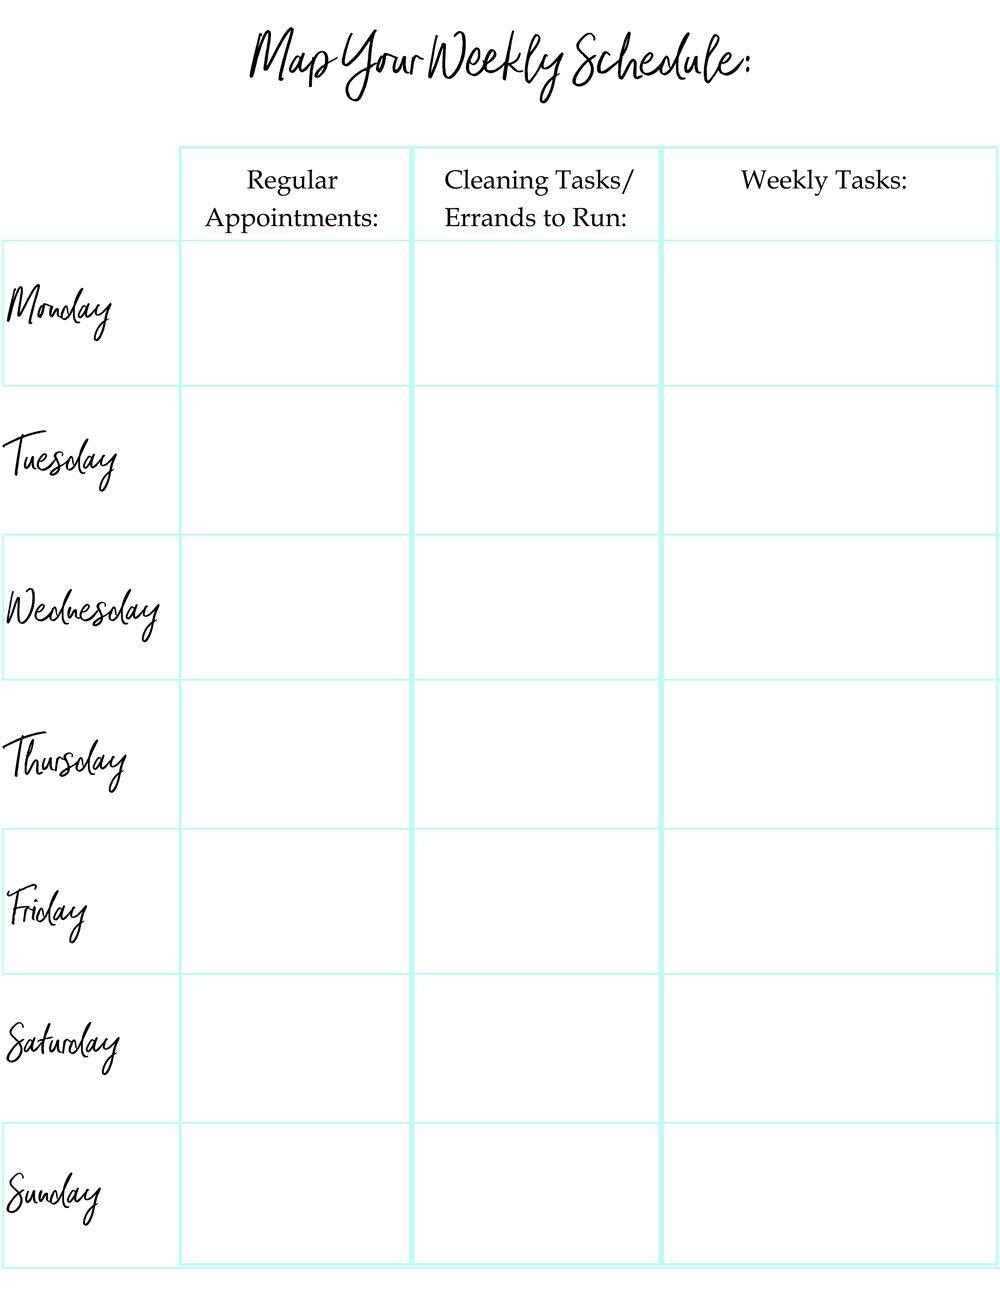 Task Planning Map -